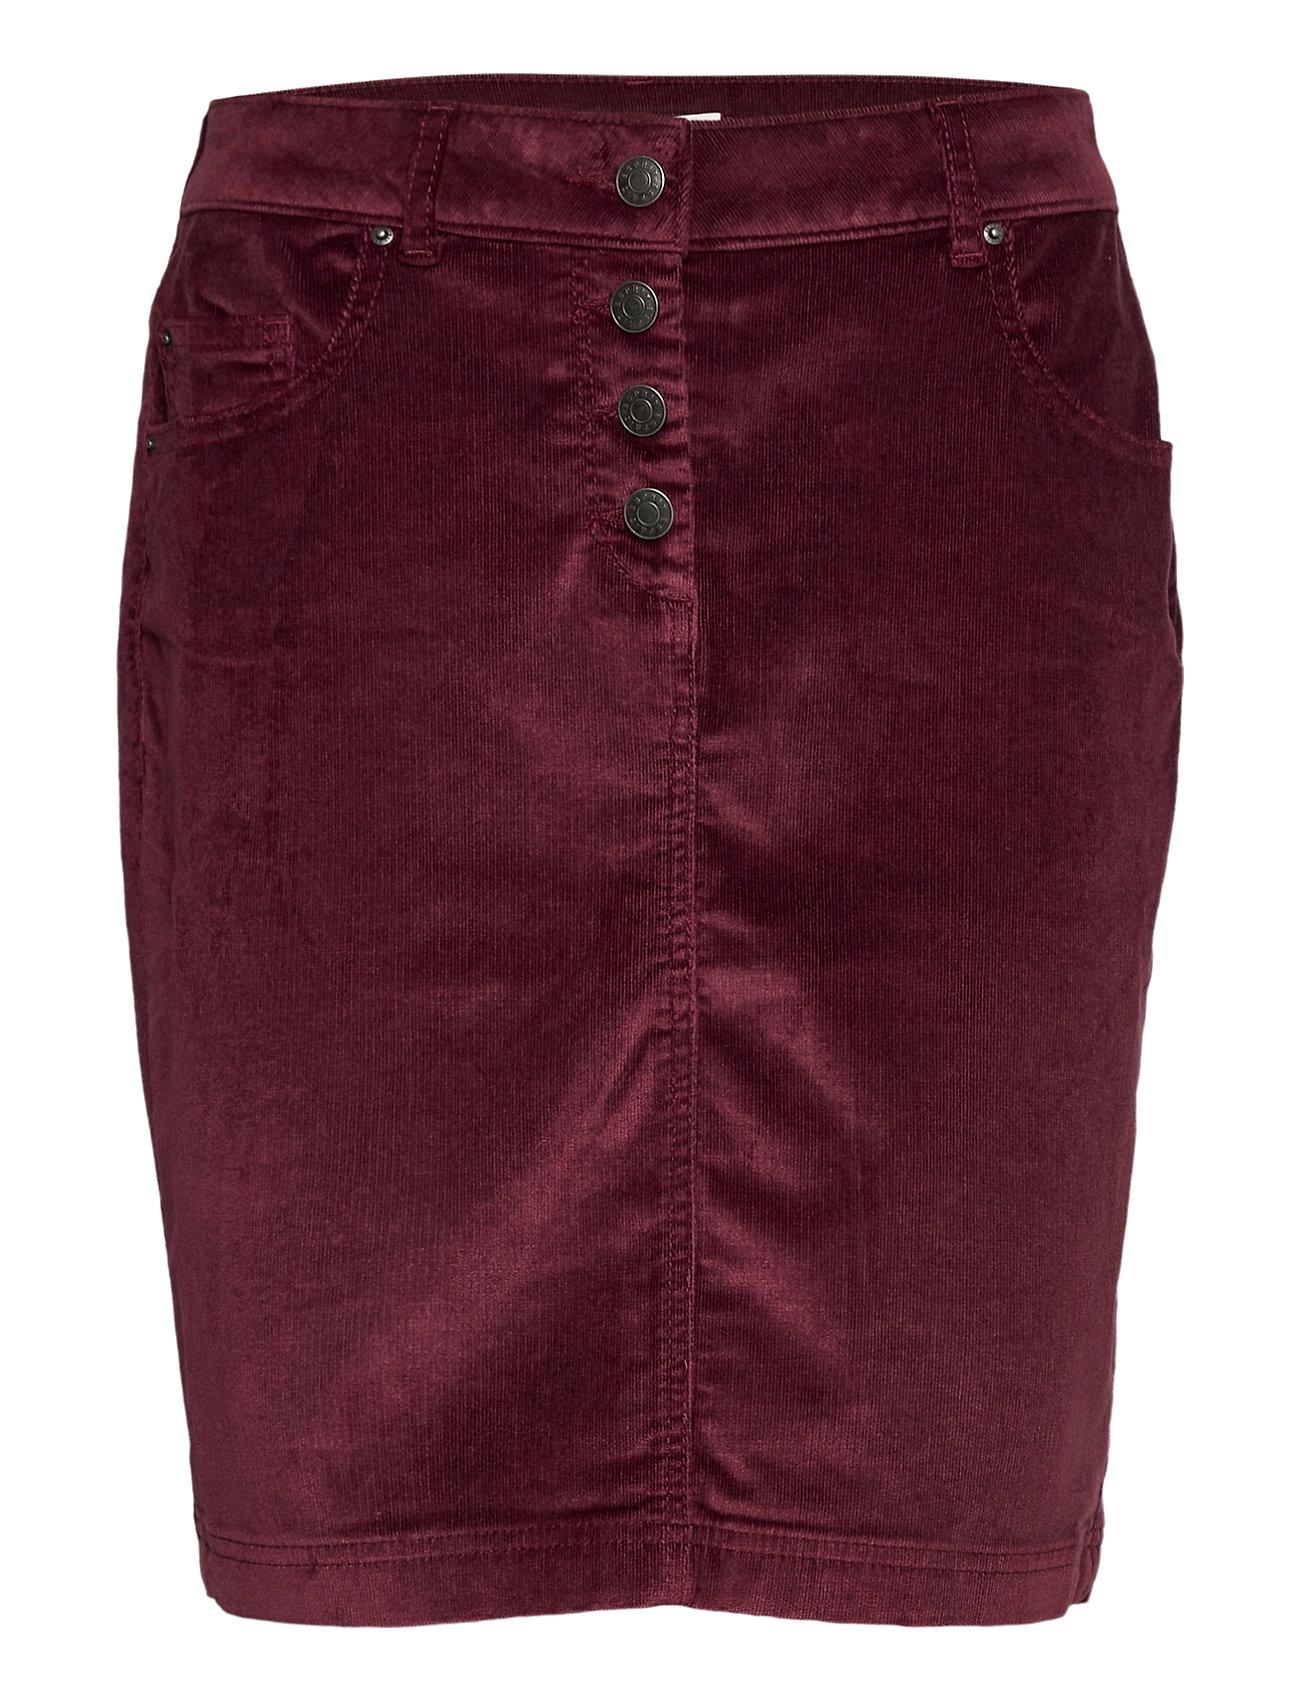 Image of Skirts Woven Kort Nederdel Rød Esprit Casual (3457715783)